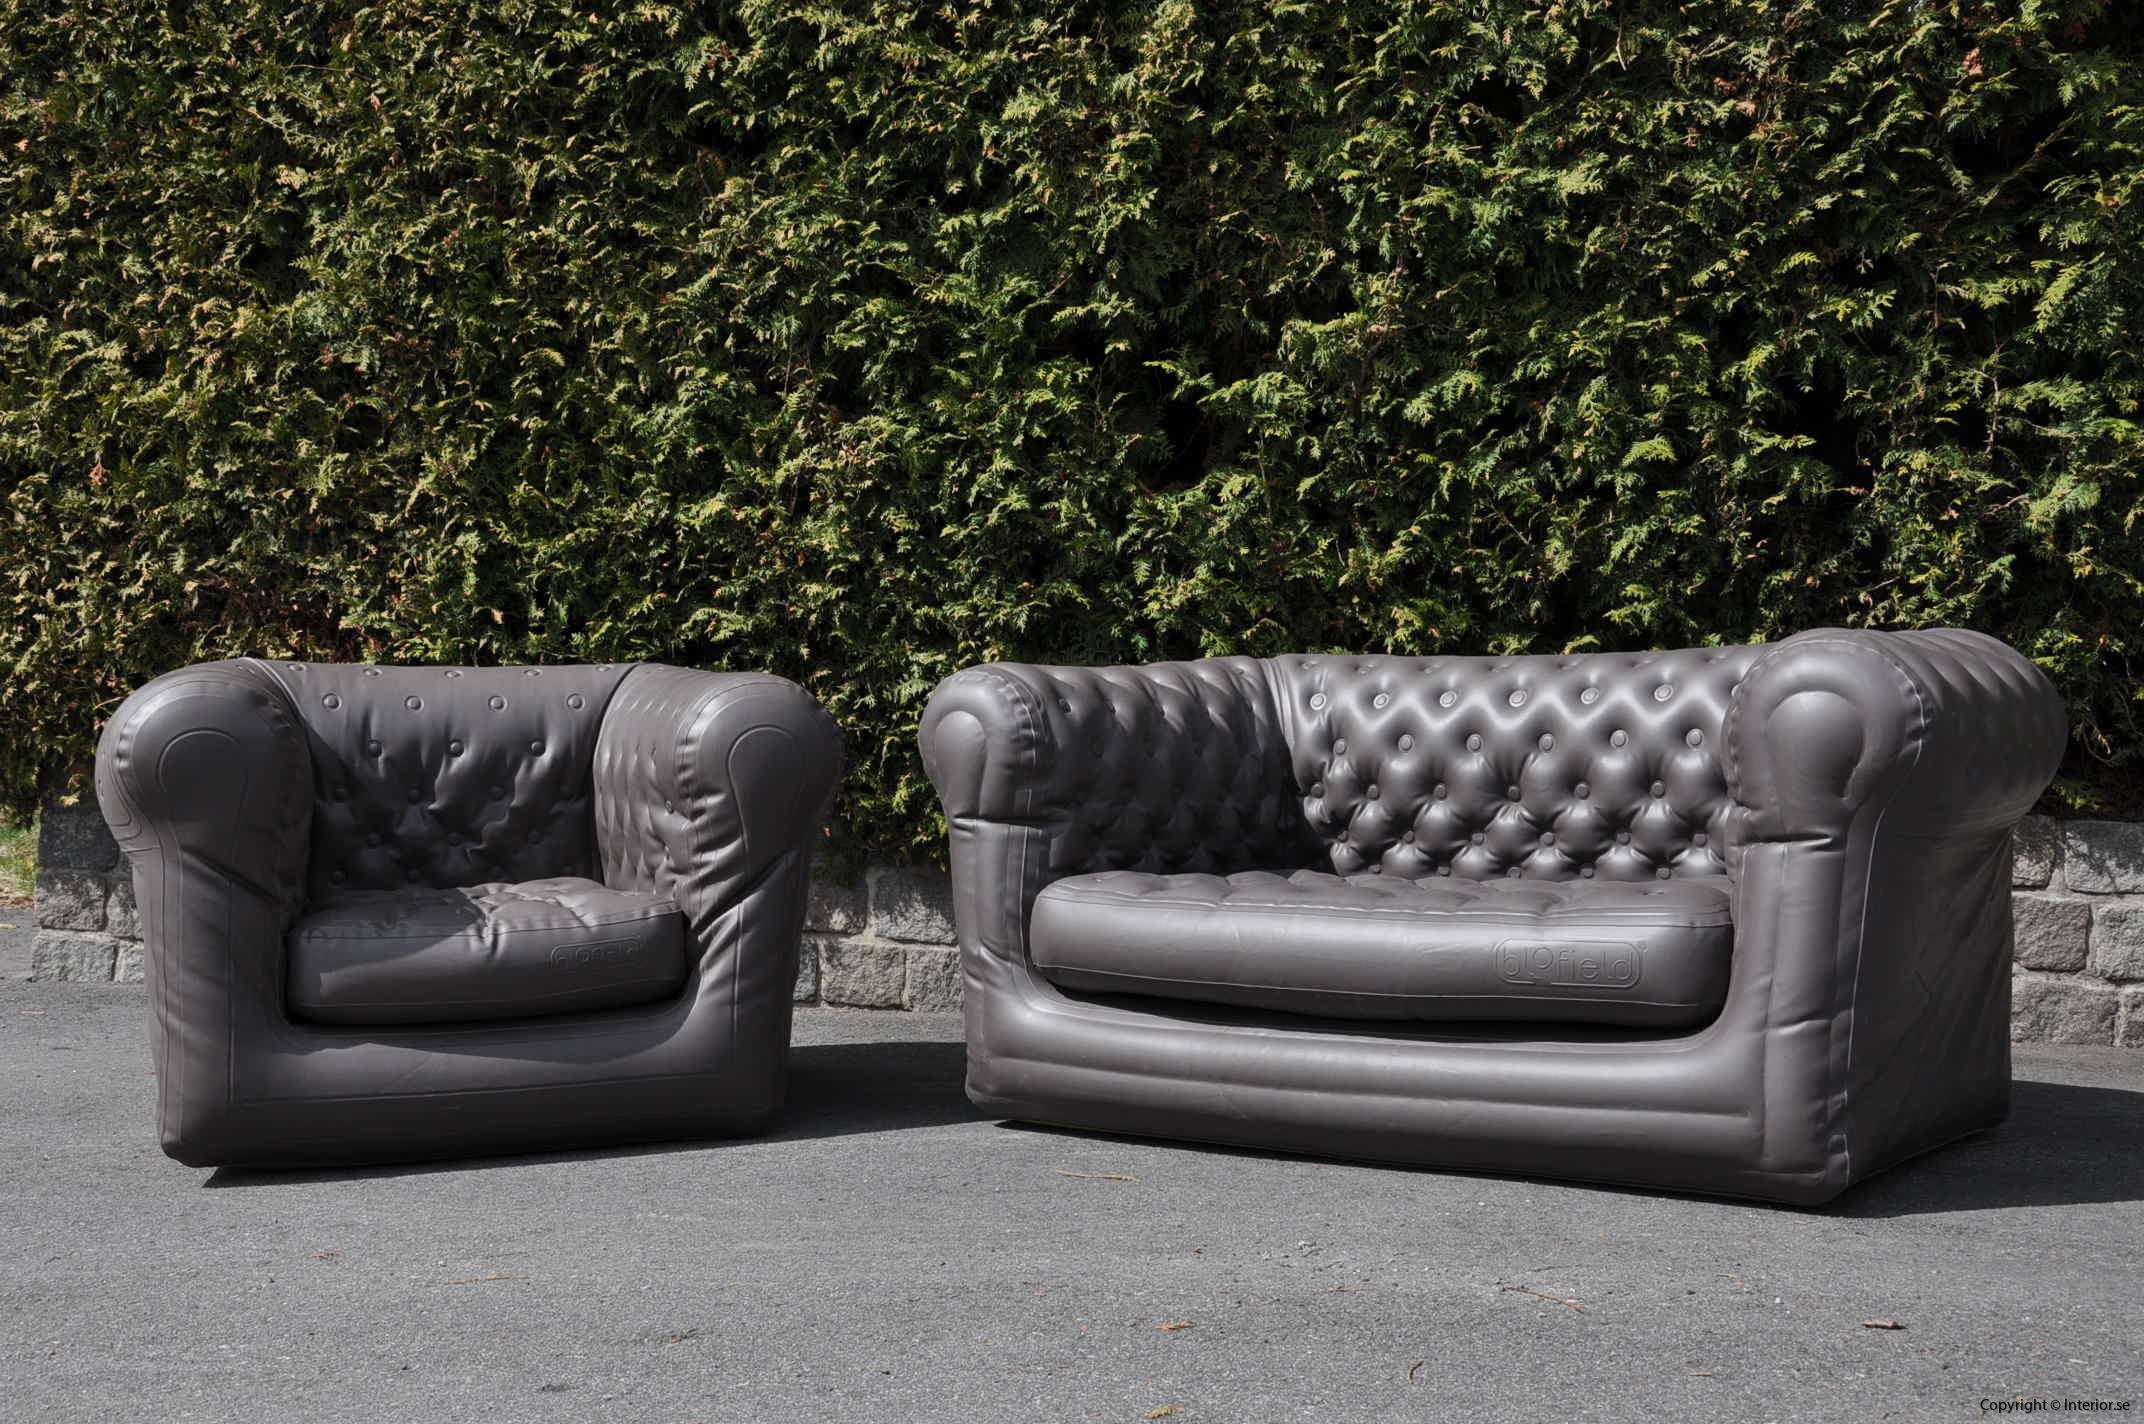 hyra uppblåsbara möbler hyr möbler event stockholm blofield furniture event sweden